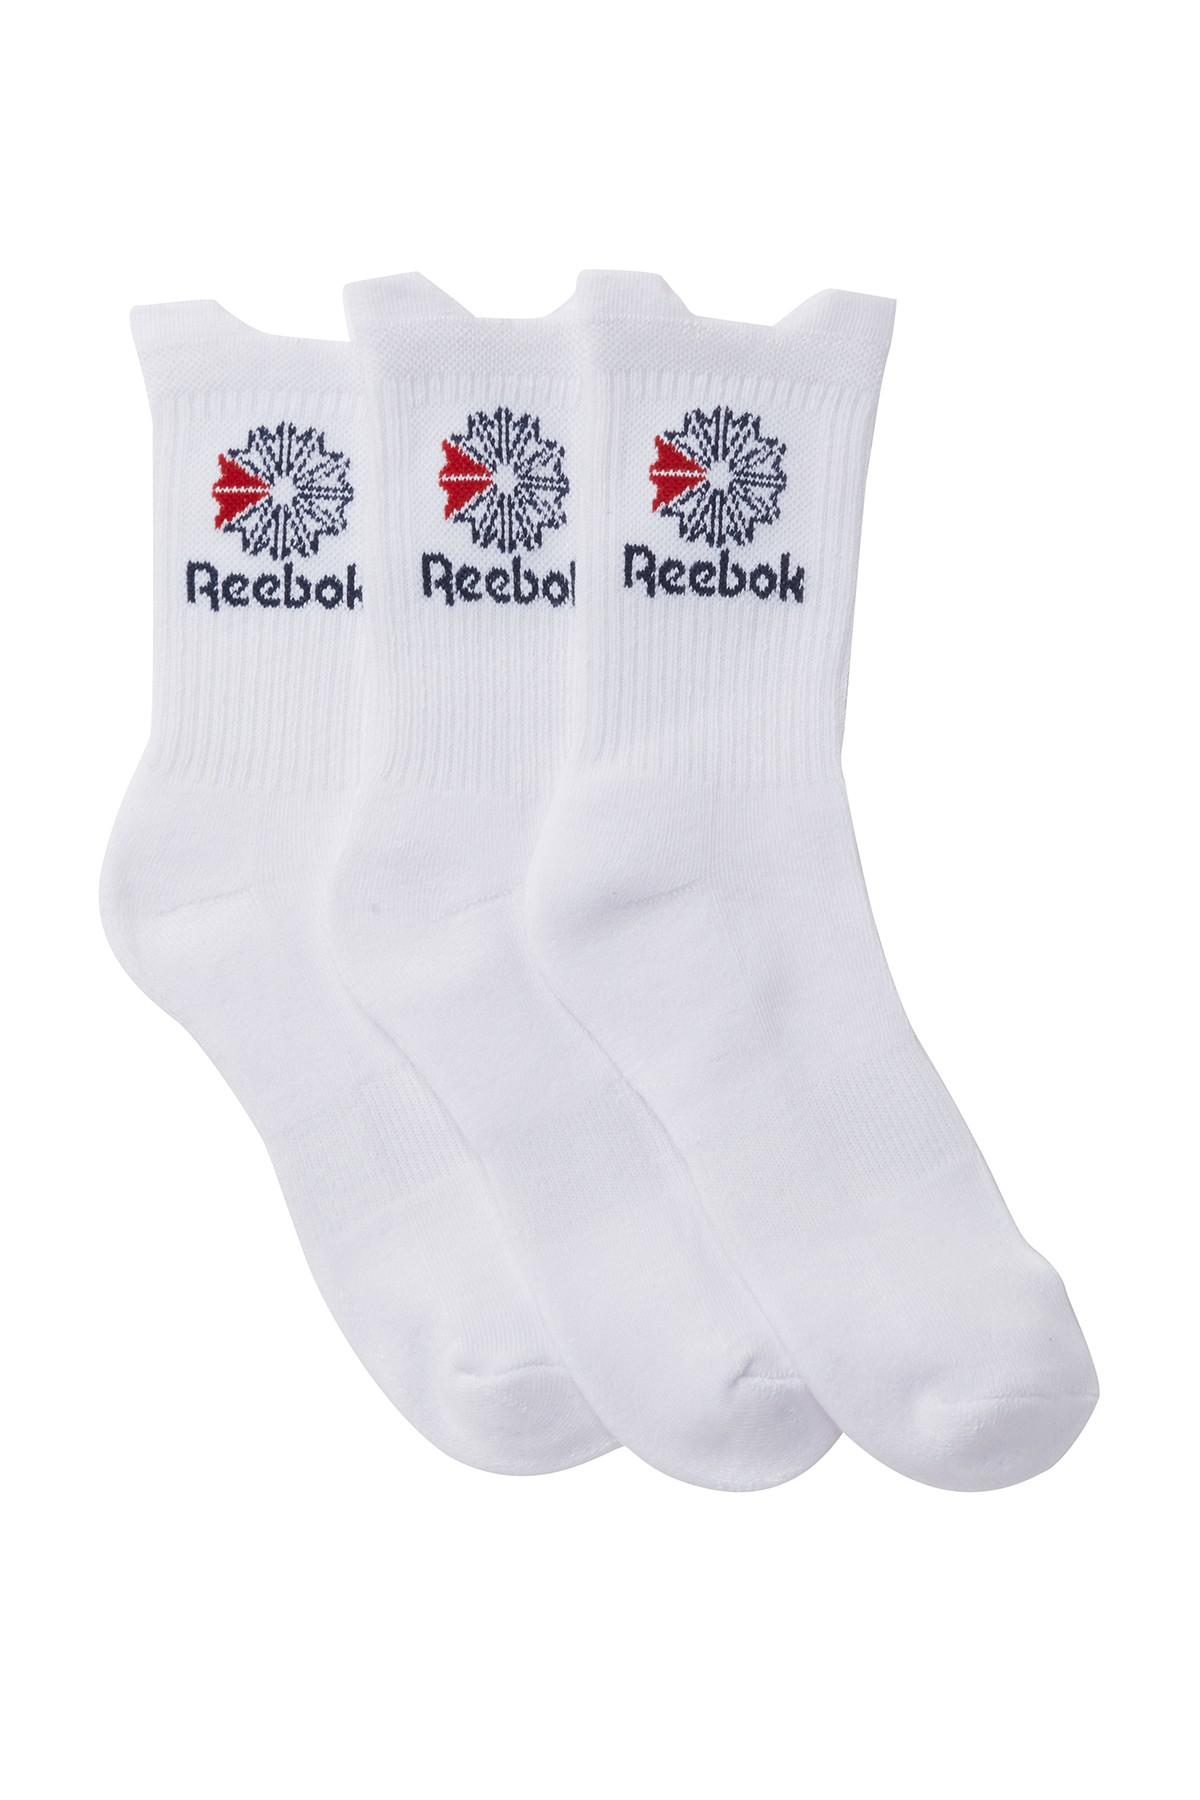 Reebok Performance Crew Cushioned Sport Socks 3 Pack Sporting Goods Socks